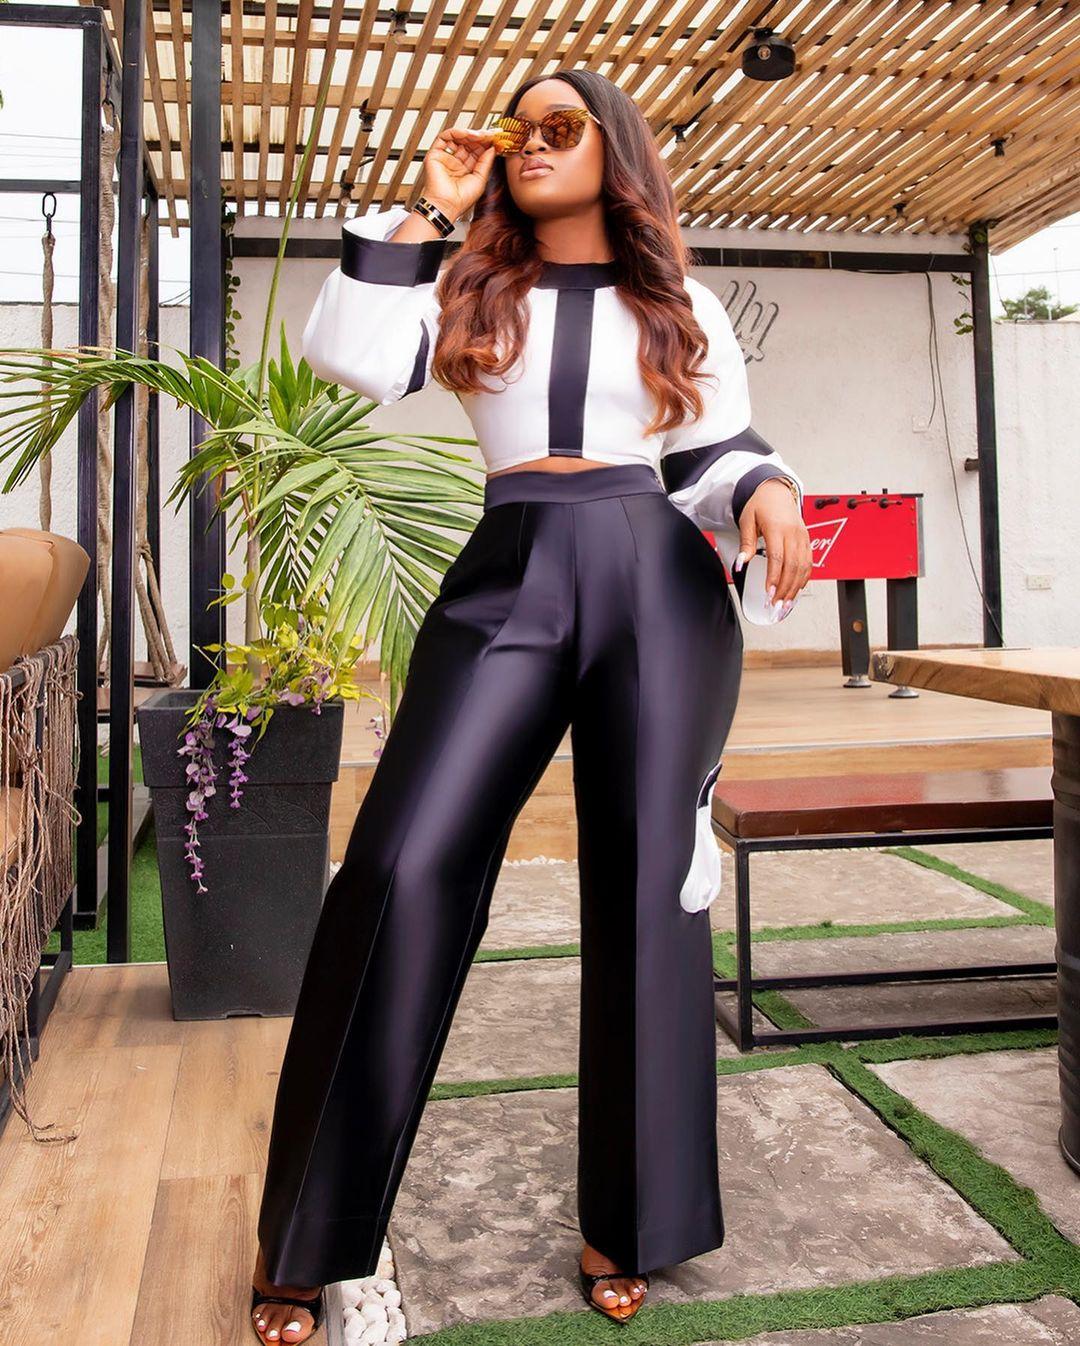 Cynthia Nwadiora: Crop Top With Pant